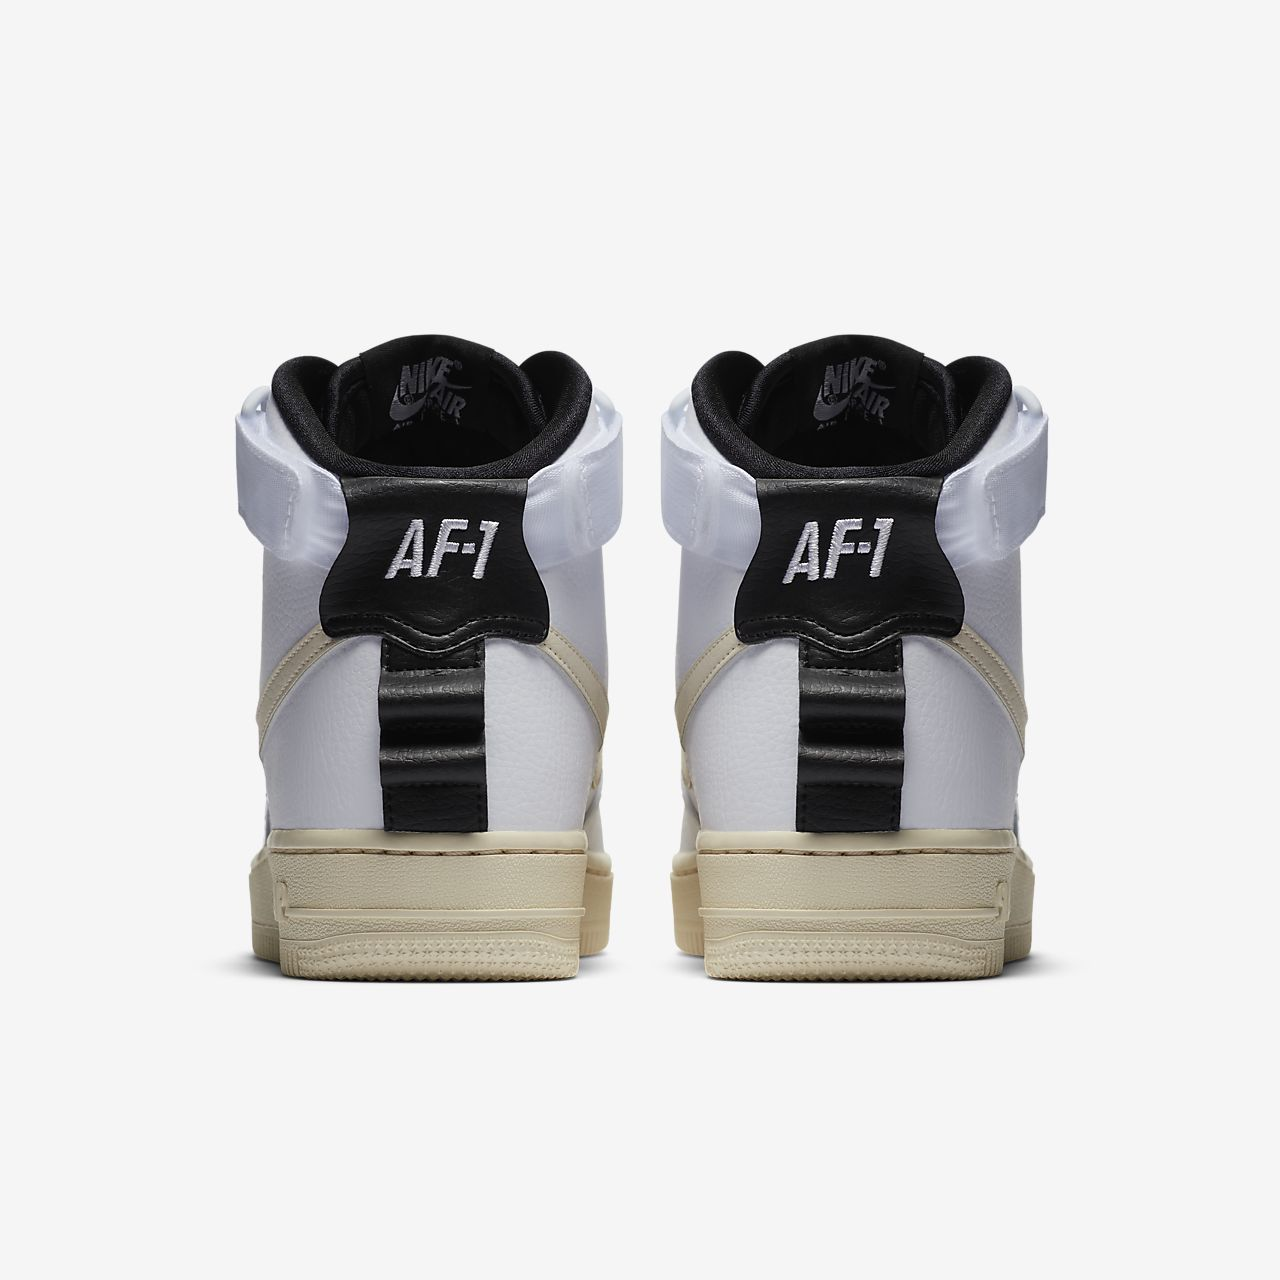 ecb0610b50 Nike Air Force 1 High Utility Women's Shoe. Nike.com ID